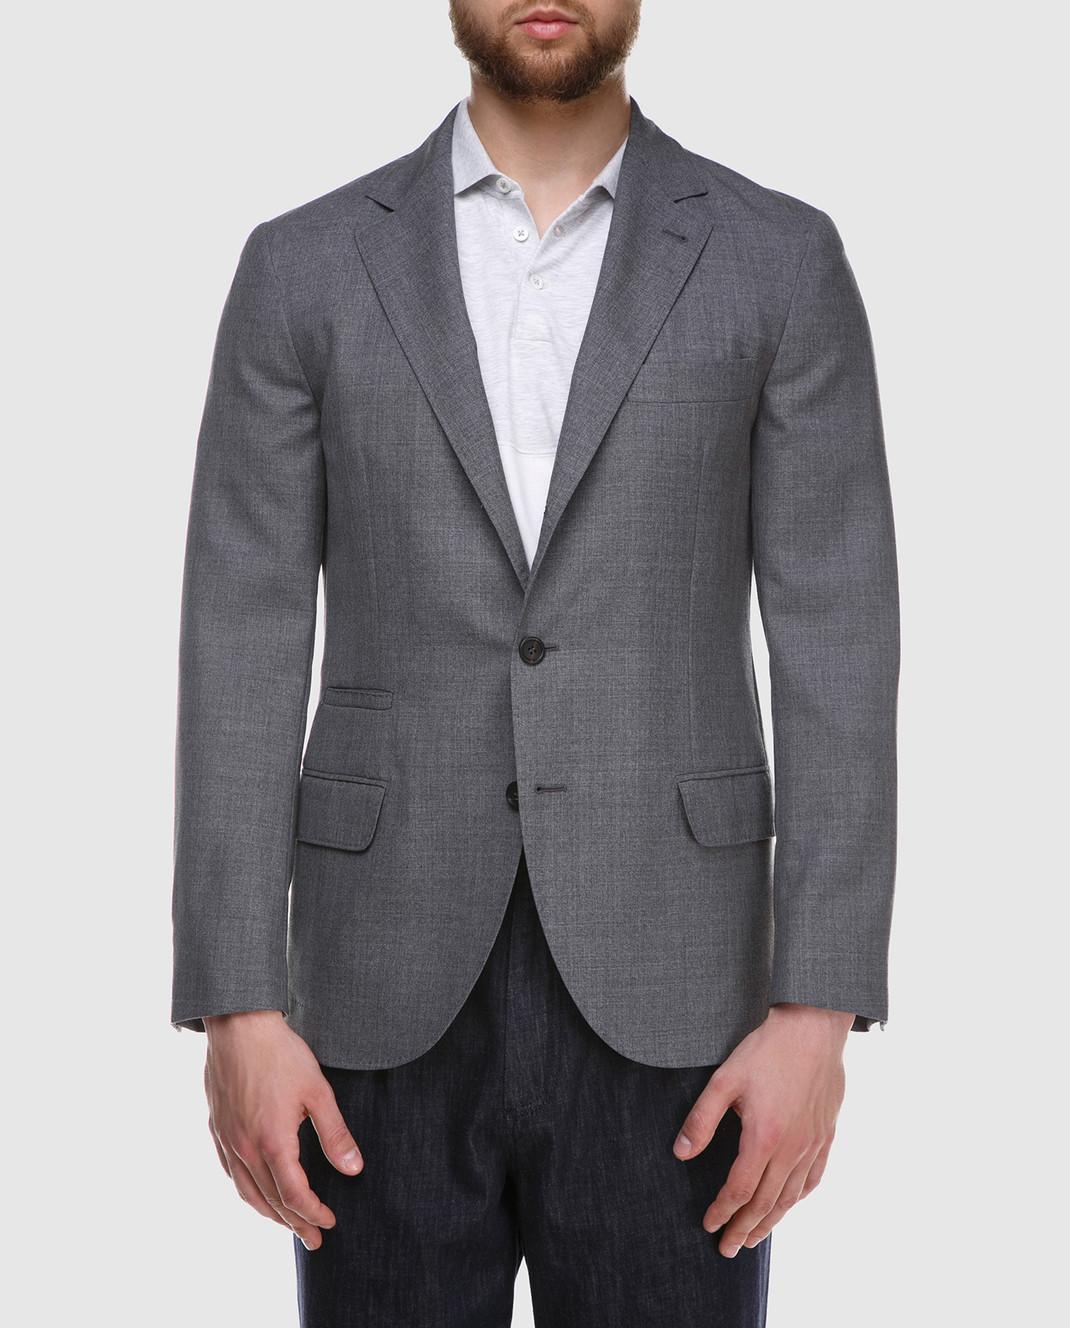 Brunello Cucinelli Серый пиджак из шерсти MF4237BTD изображение 3